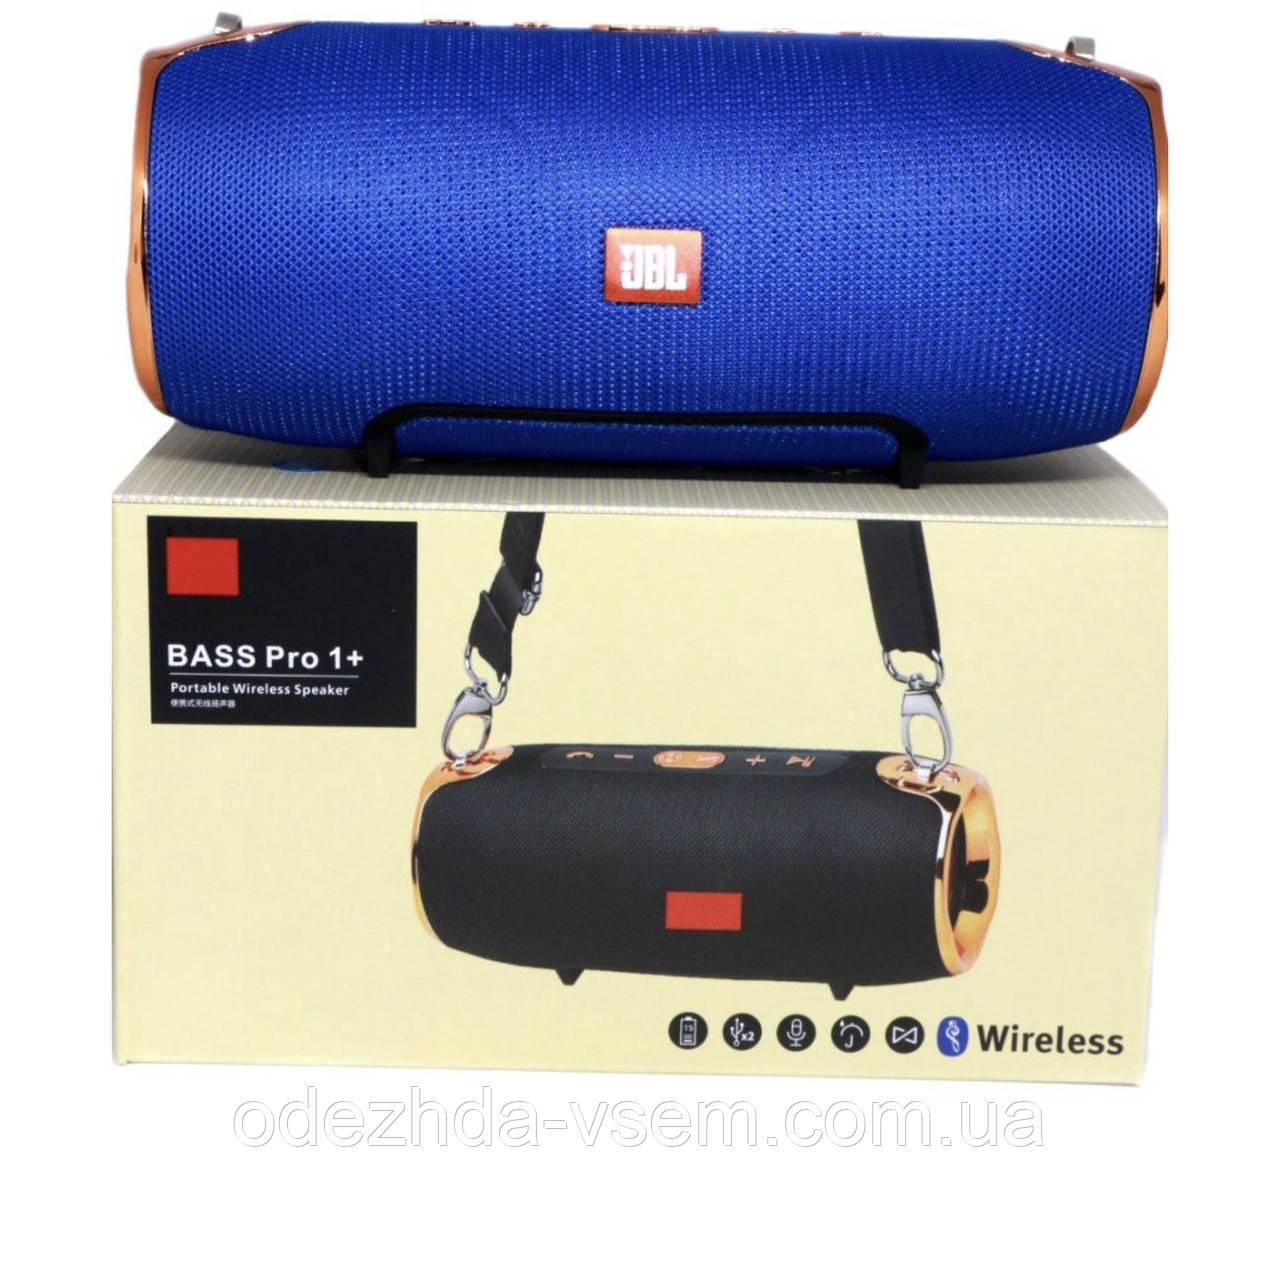 Портативная Bluetooth колонка JBL Bass Pro 1+ ХАКИ